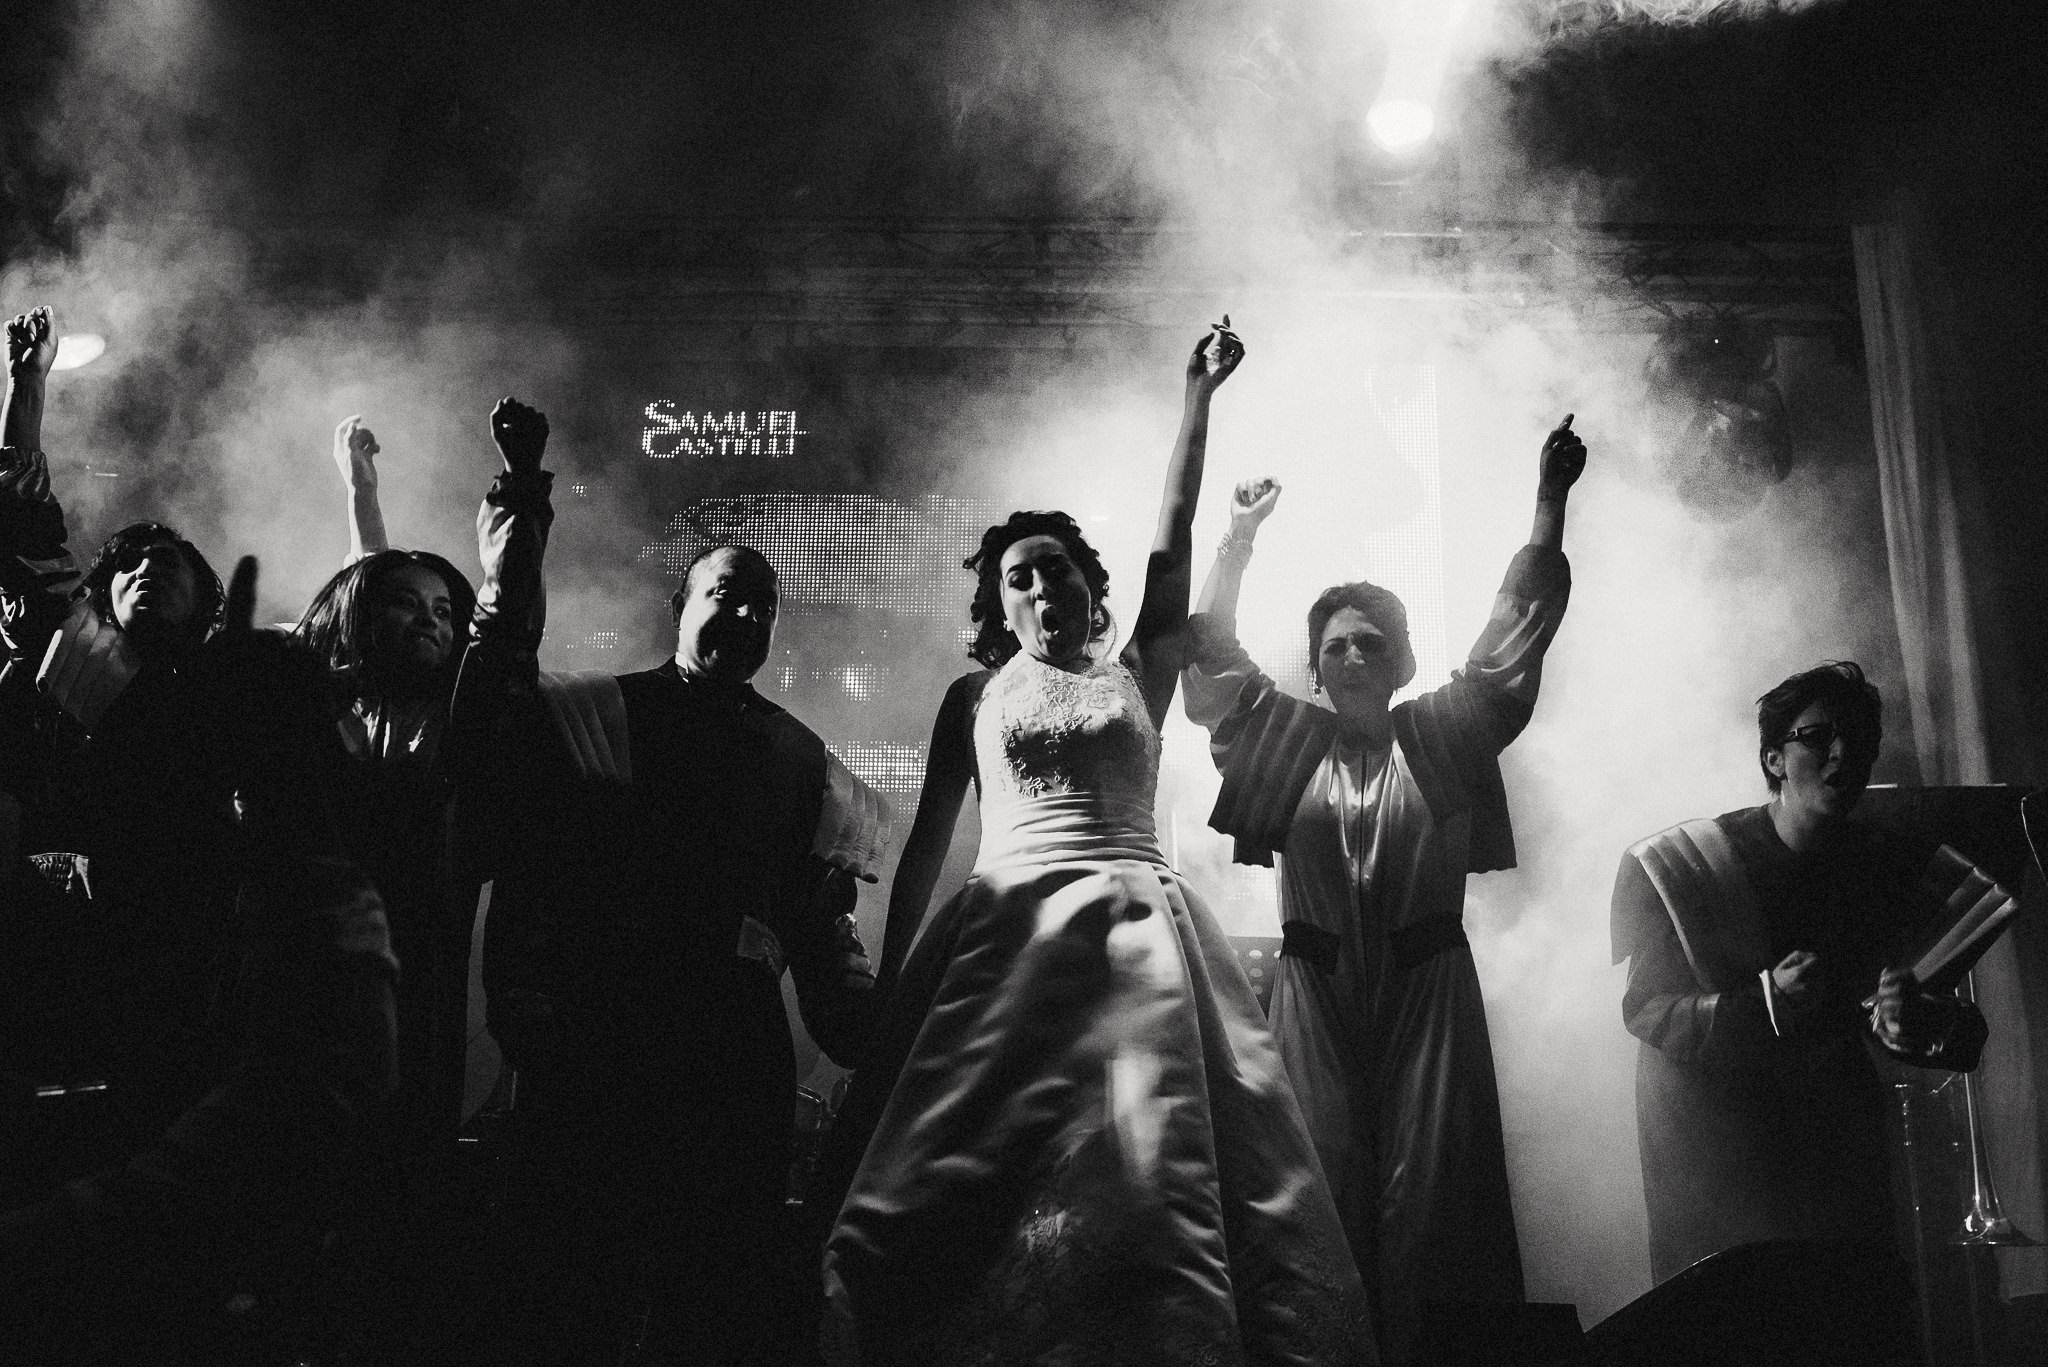 Wedding-Boda-Tulancingo-Hidalgo-Salon-Essenzia-Luis-Houdin-80-film